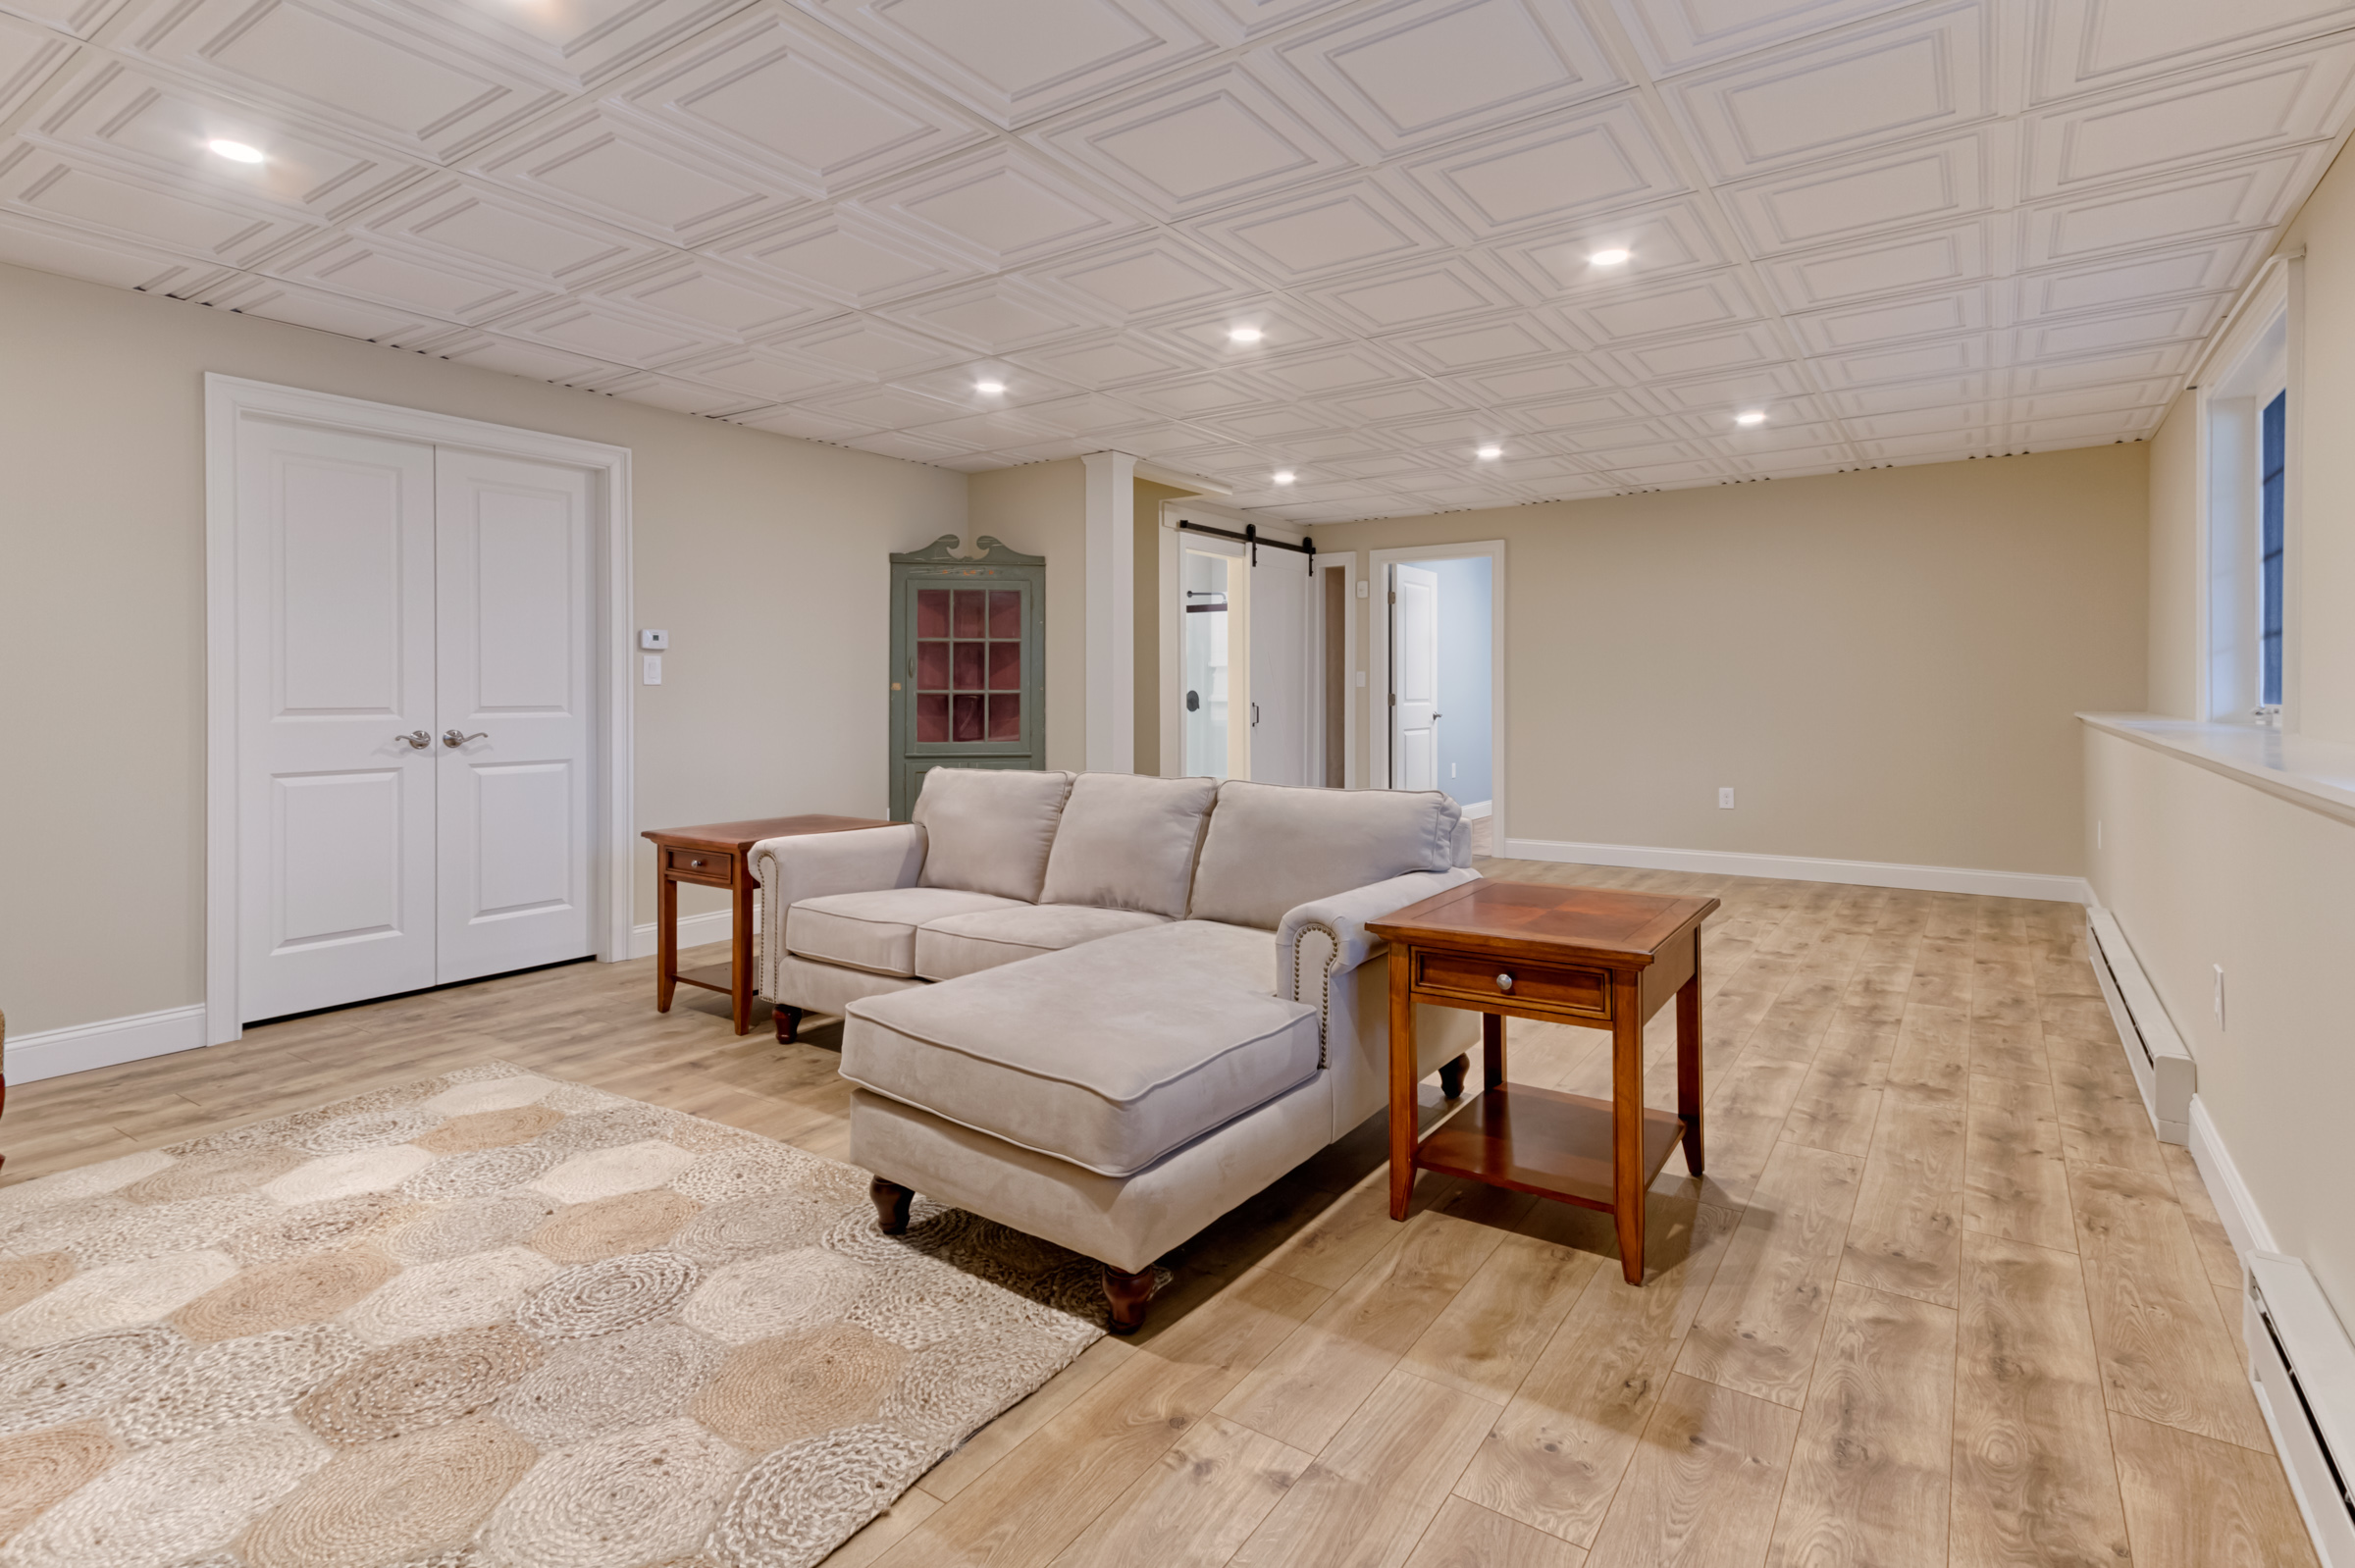 Living room - View 2.jpg